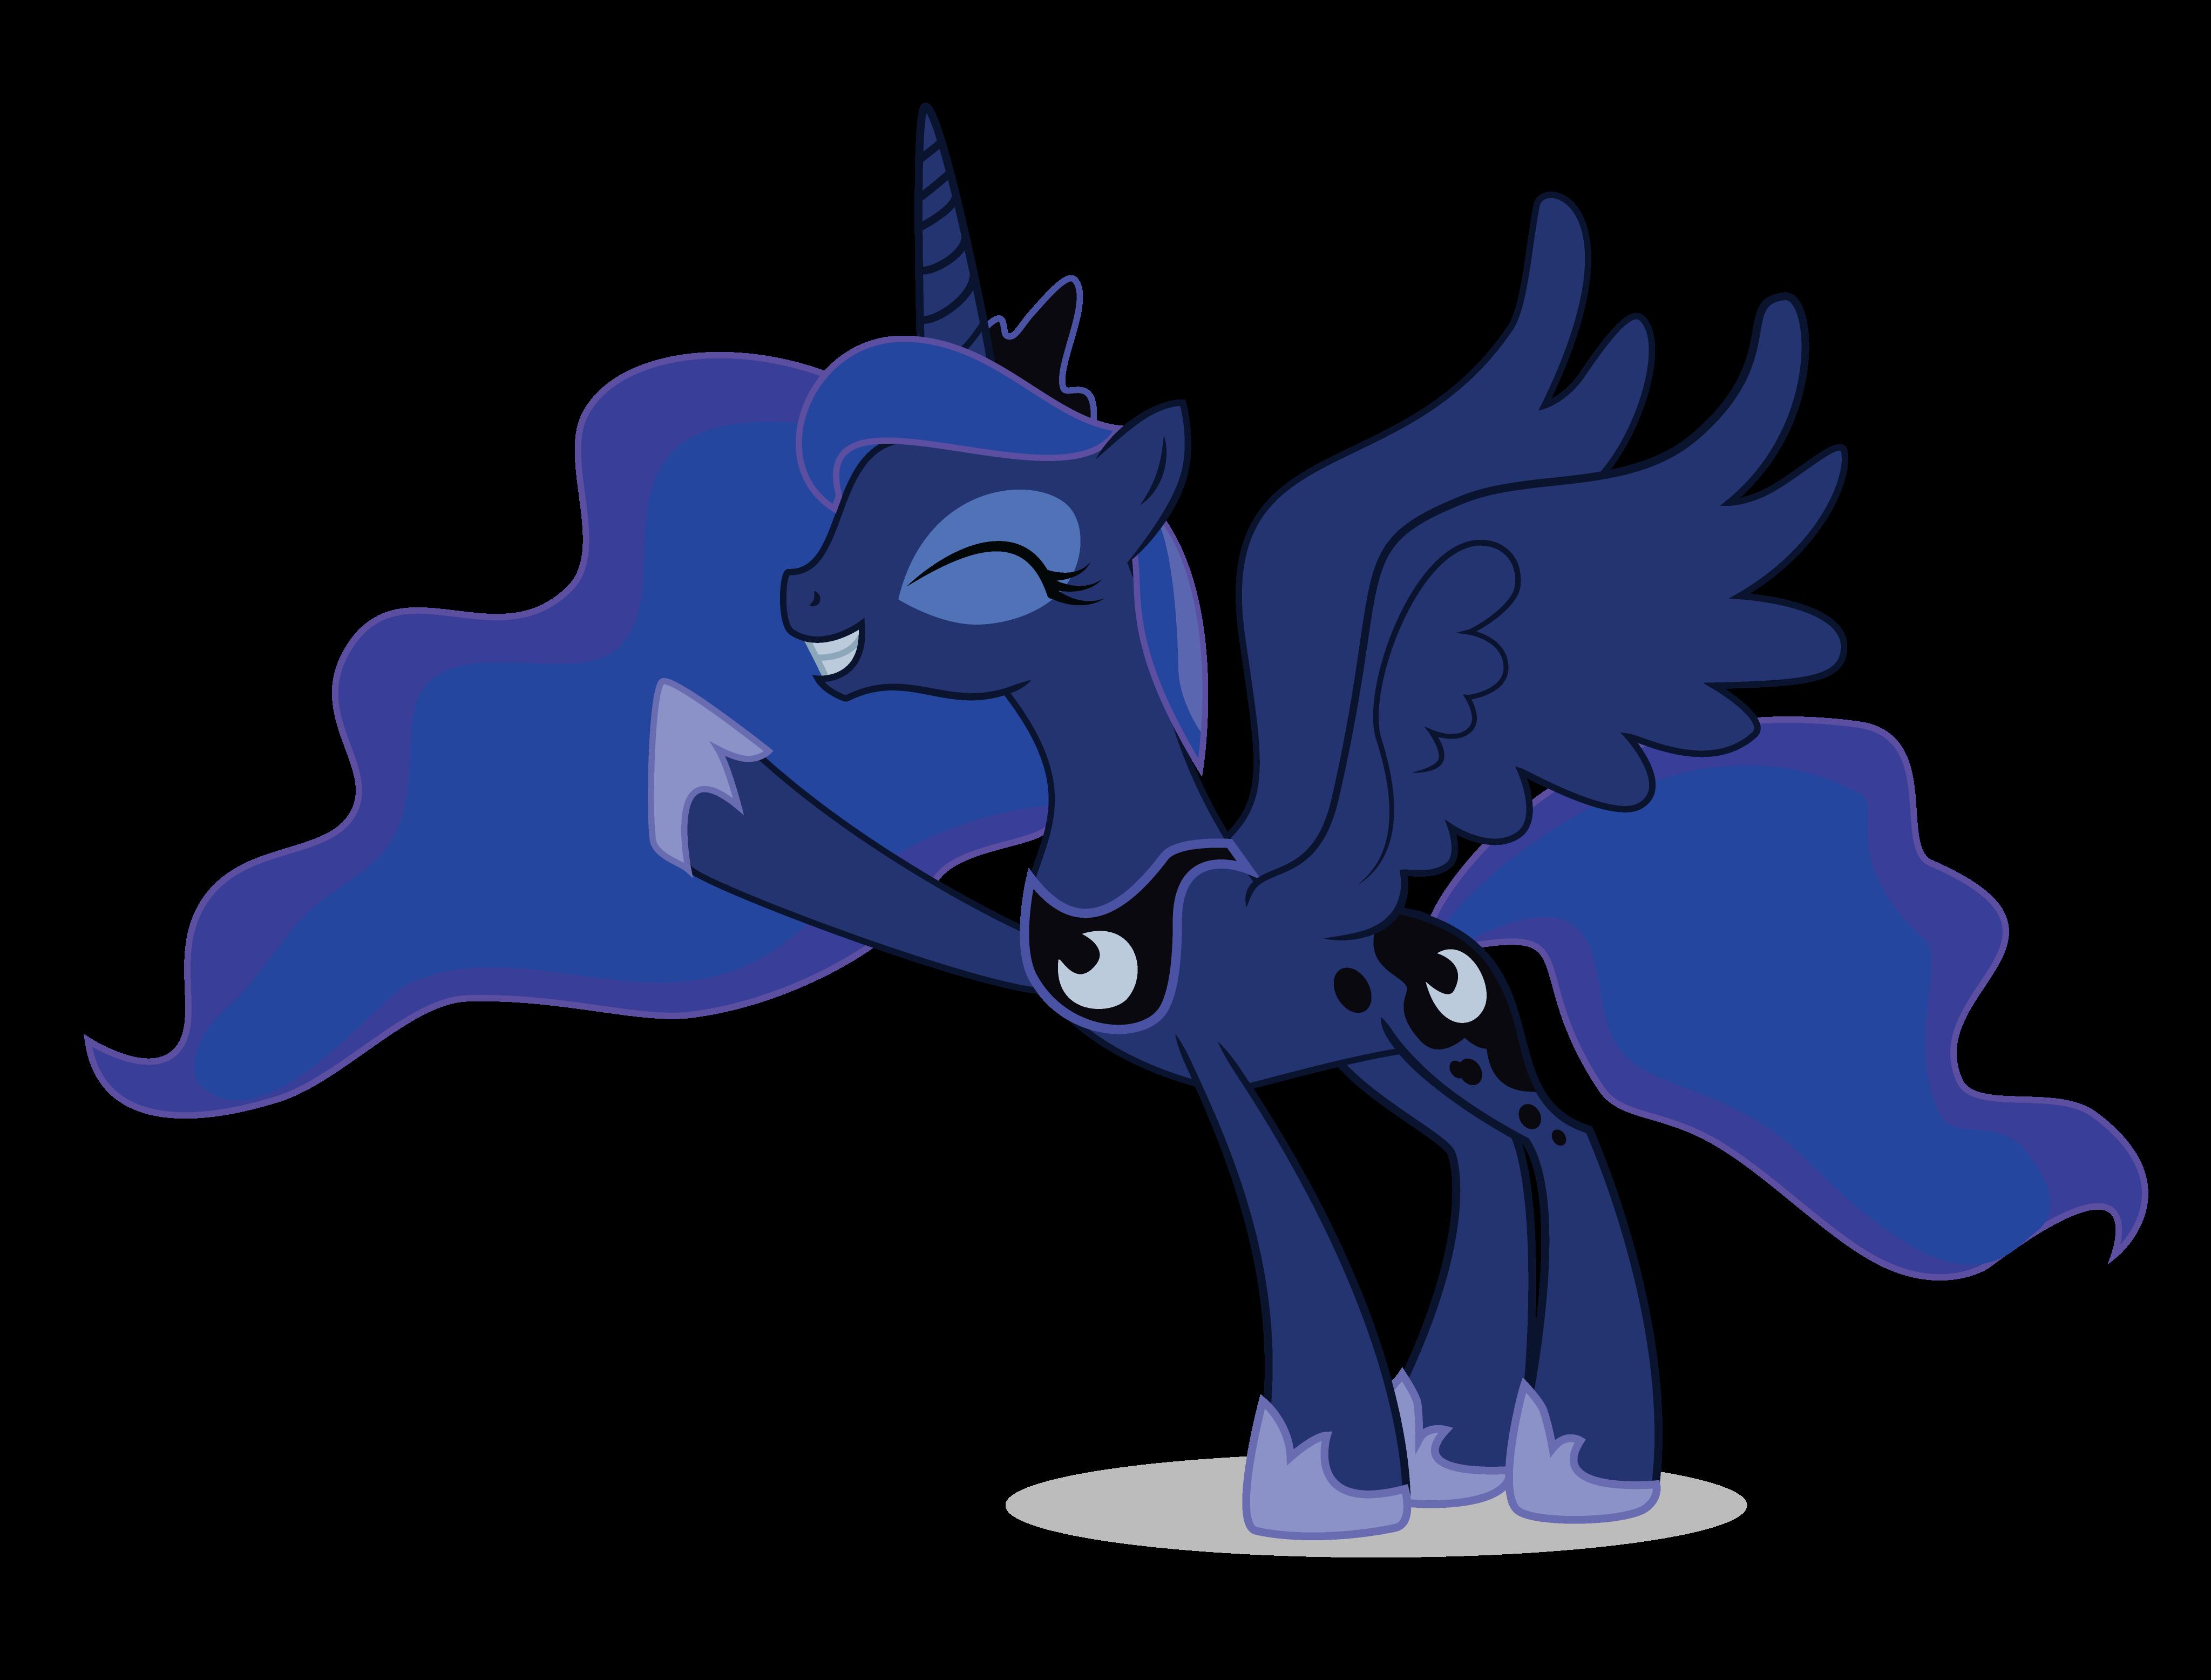 Happy Princess Luna by Slawe on DeviantArt